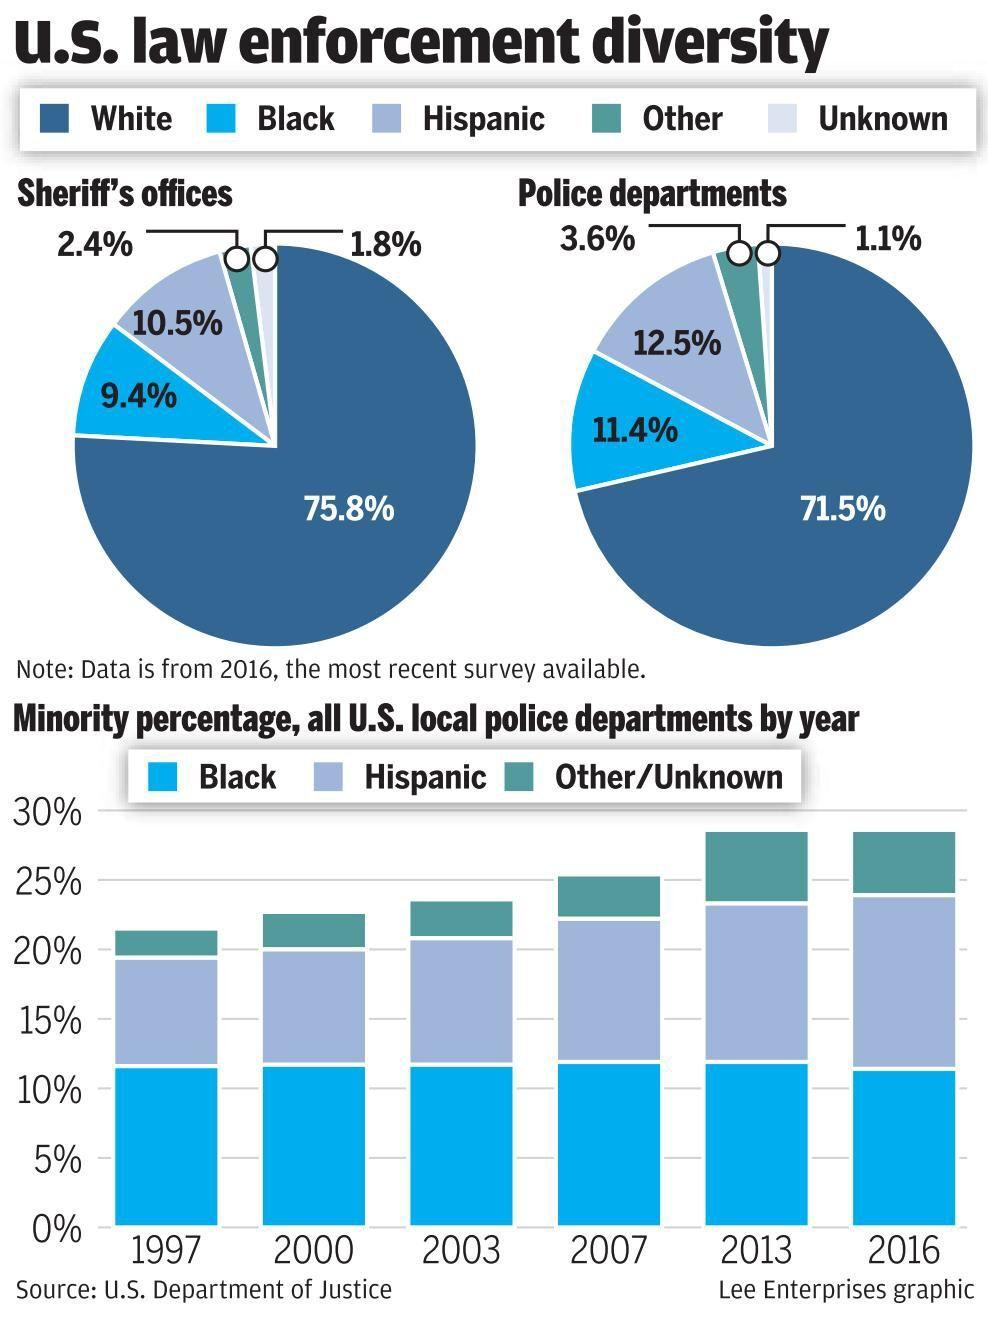 Diversity in law enforcement